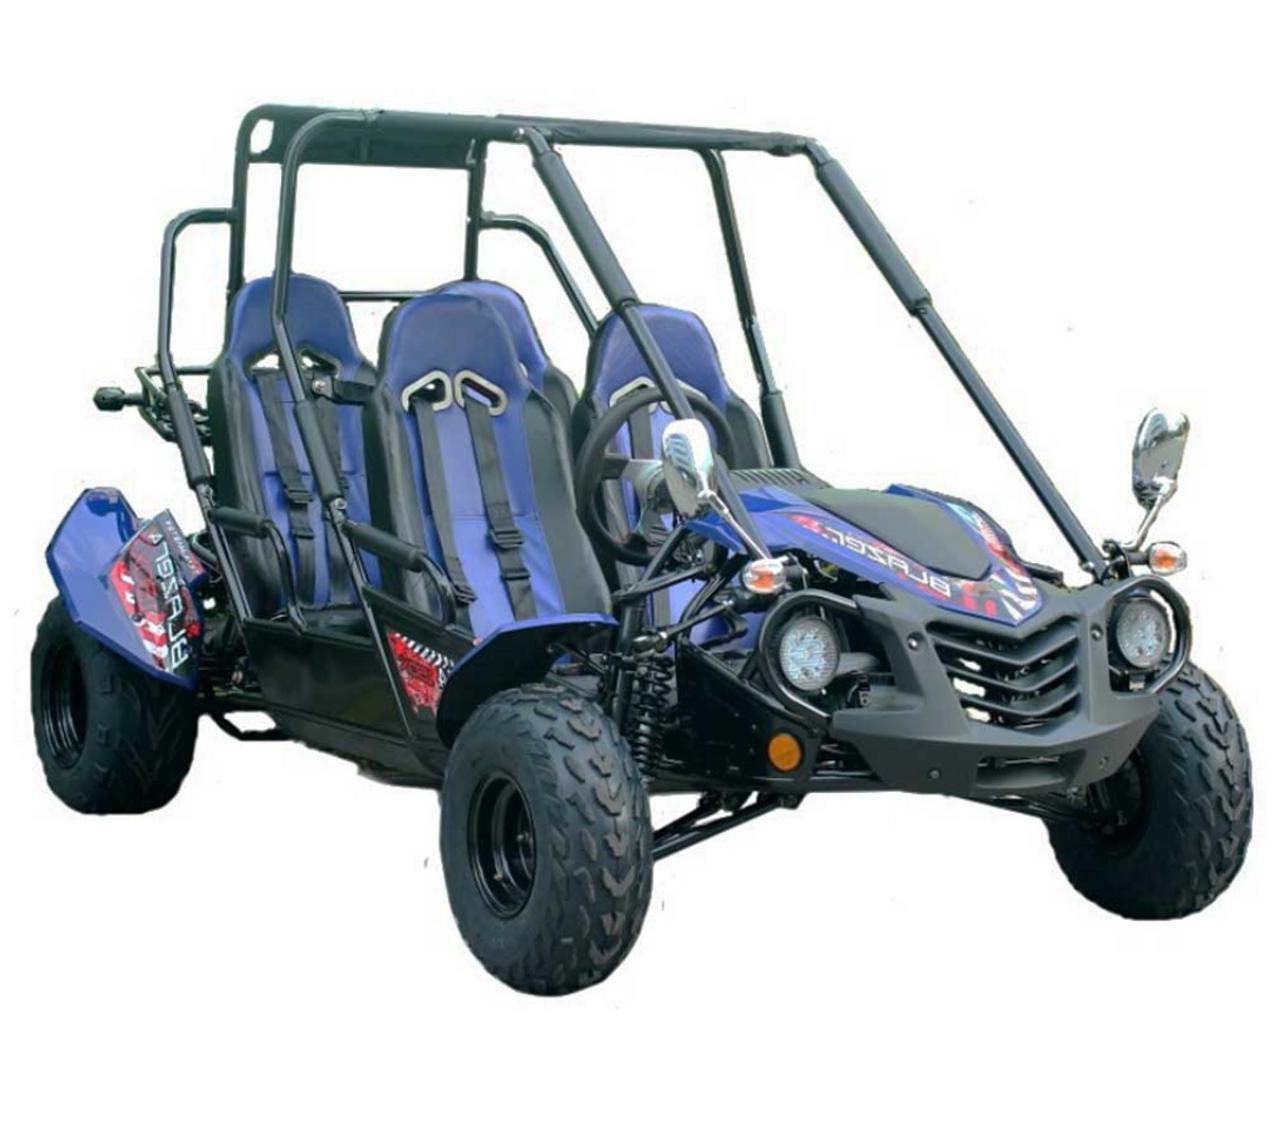 TrailMaster Blazer4 150X Go Kart - Blue